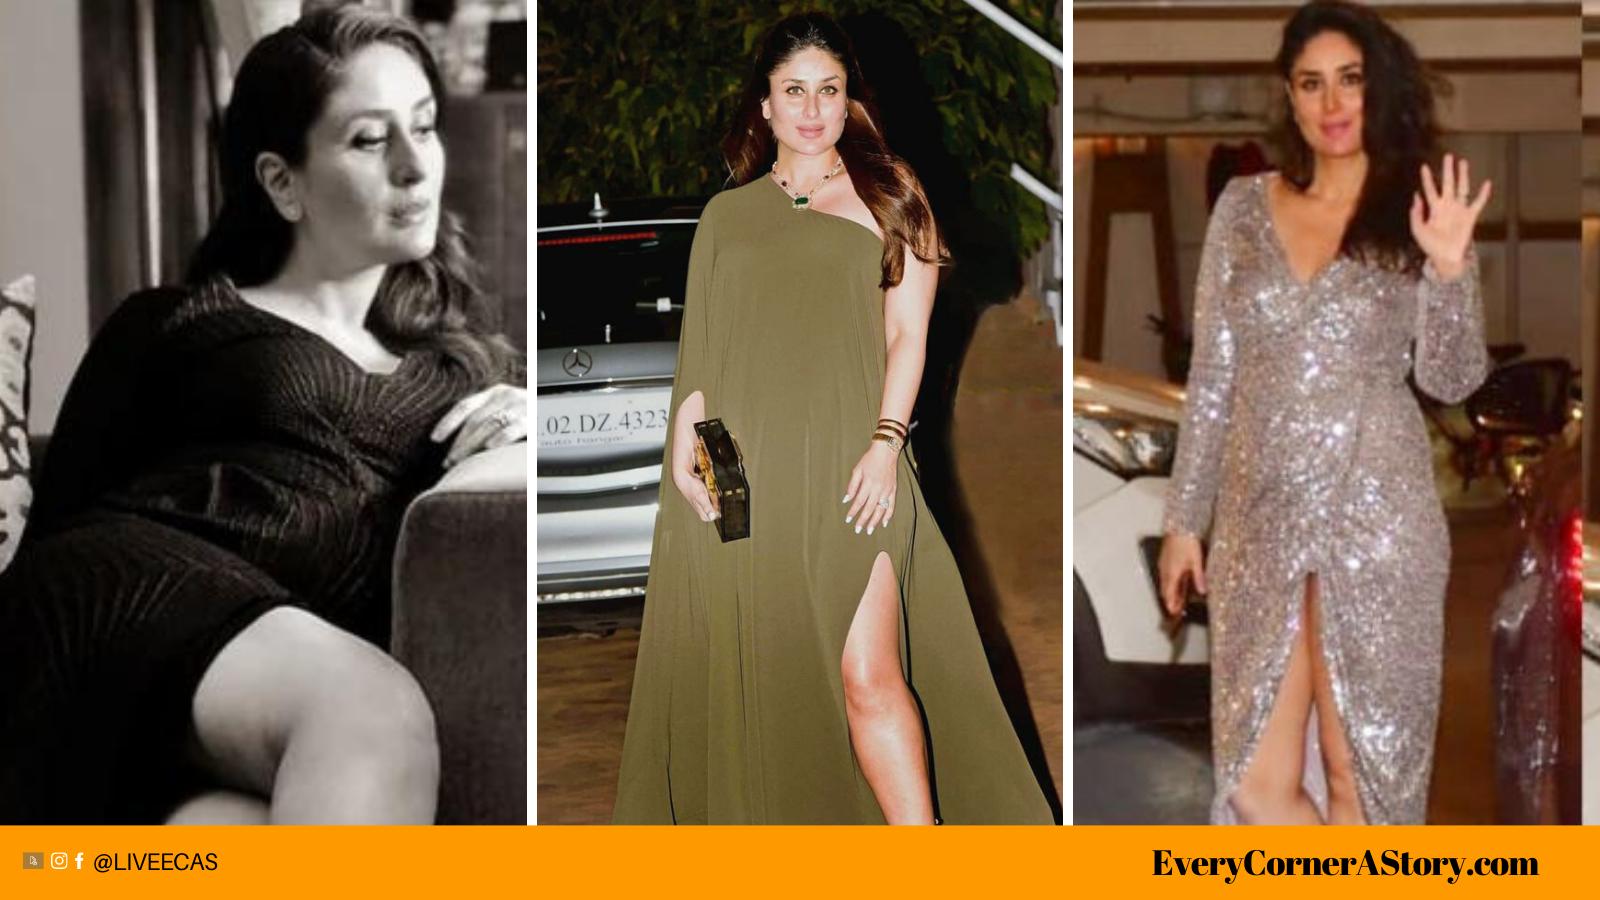 kareena kapoor thighs hot pregancy fitness ecas india every corne a story